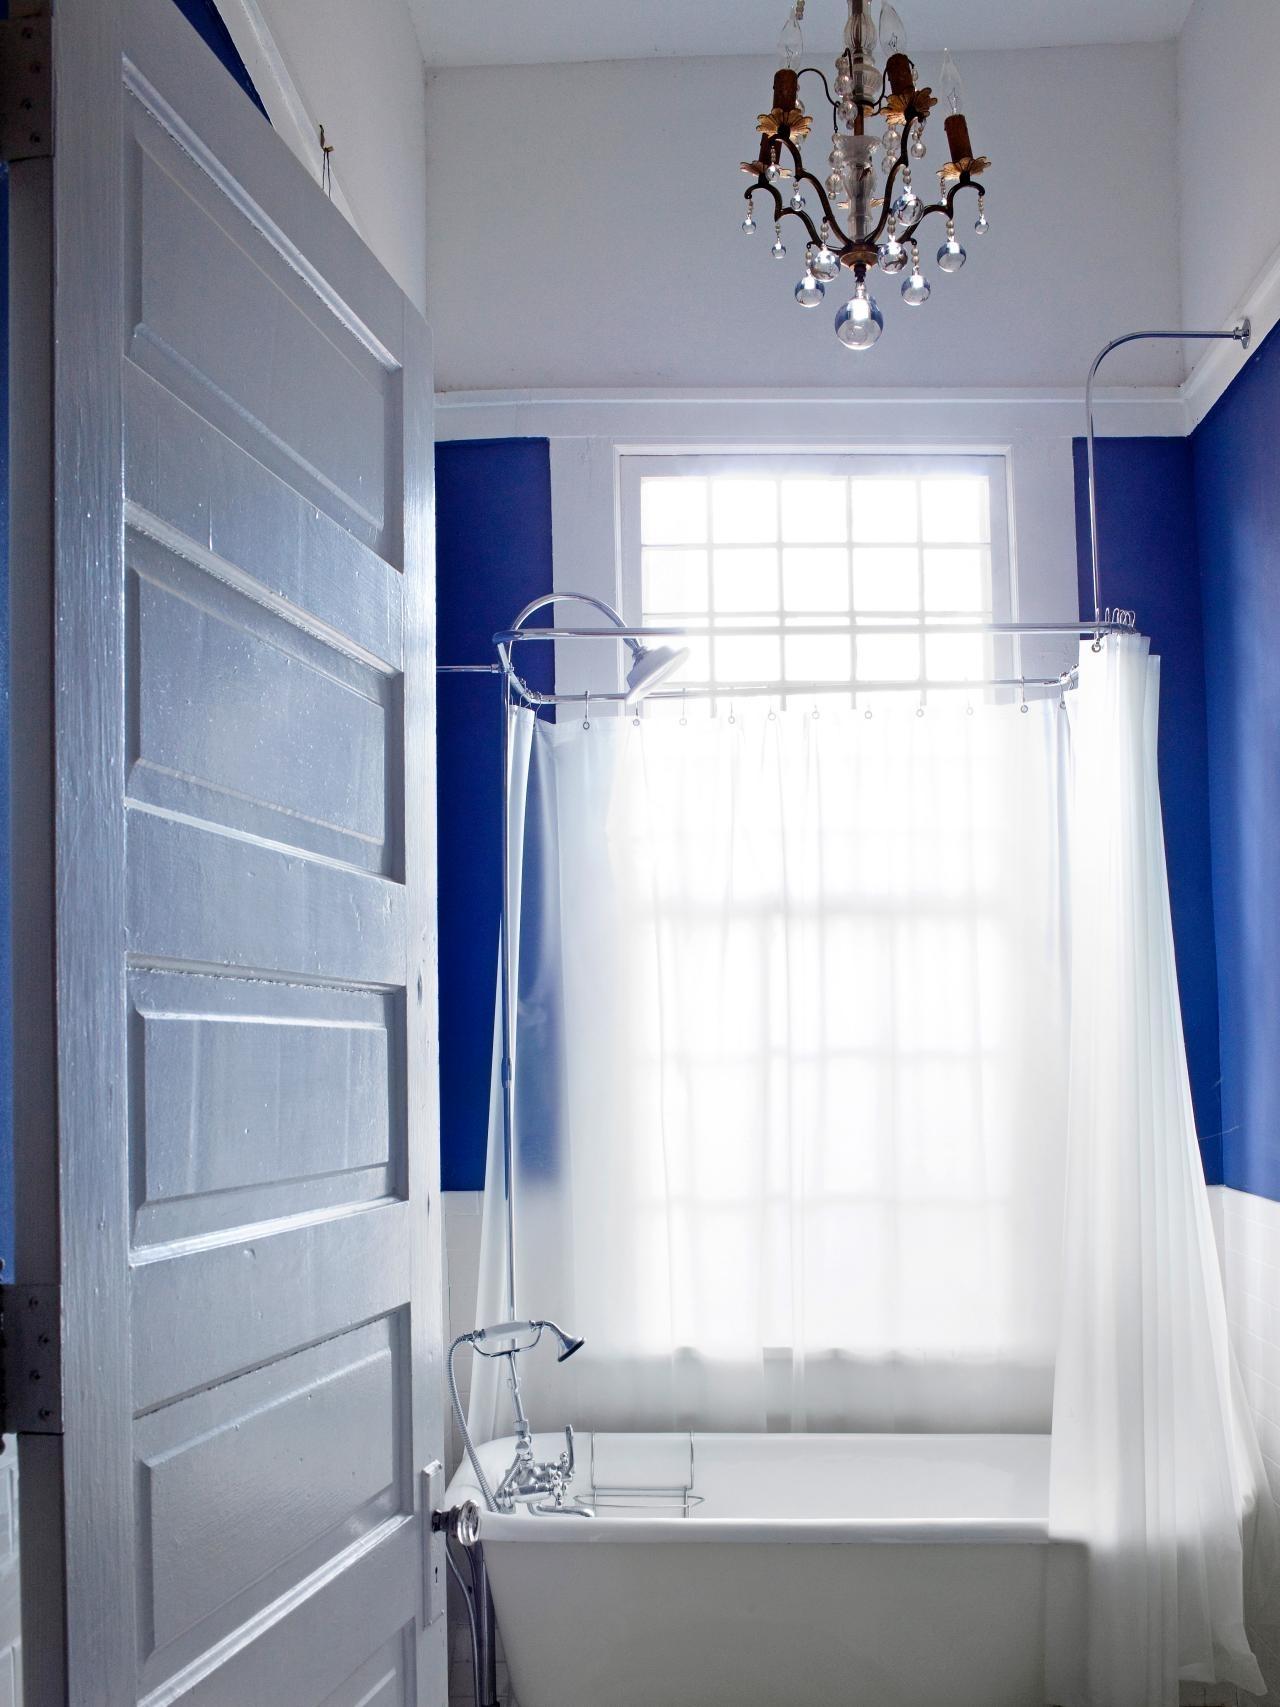 10 Attractive Bathroom Decorating Ideas For Small Bathrooms